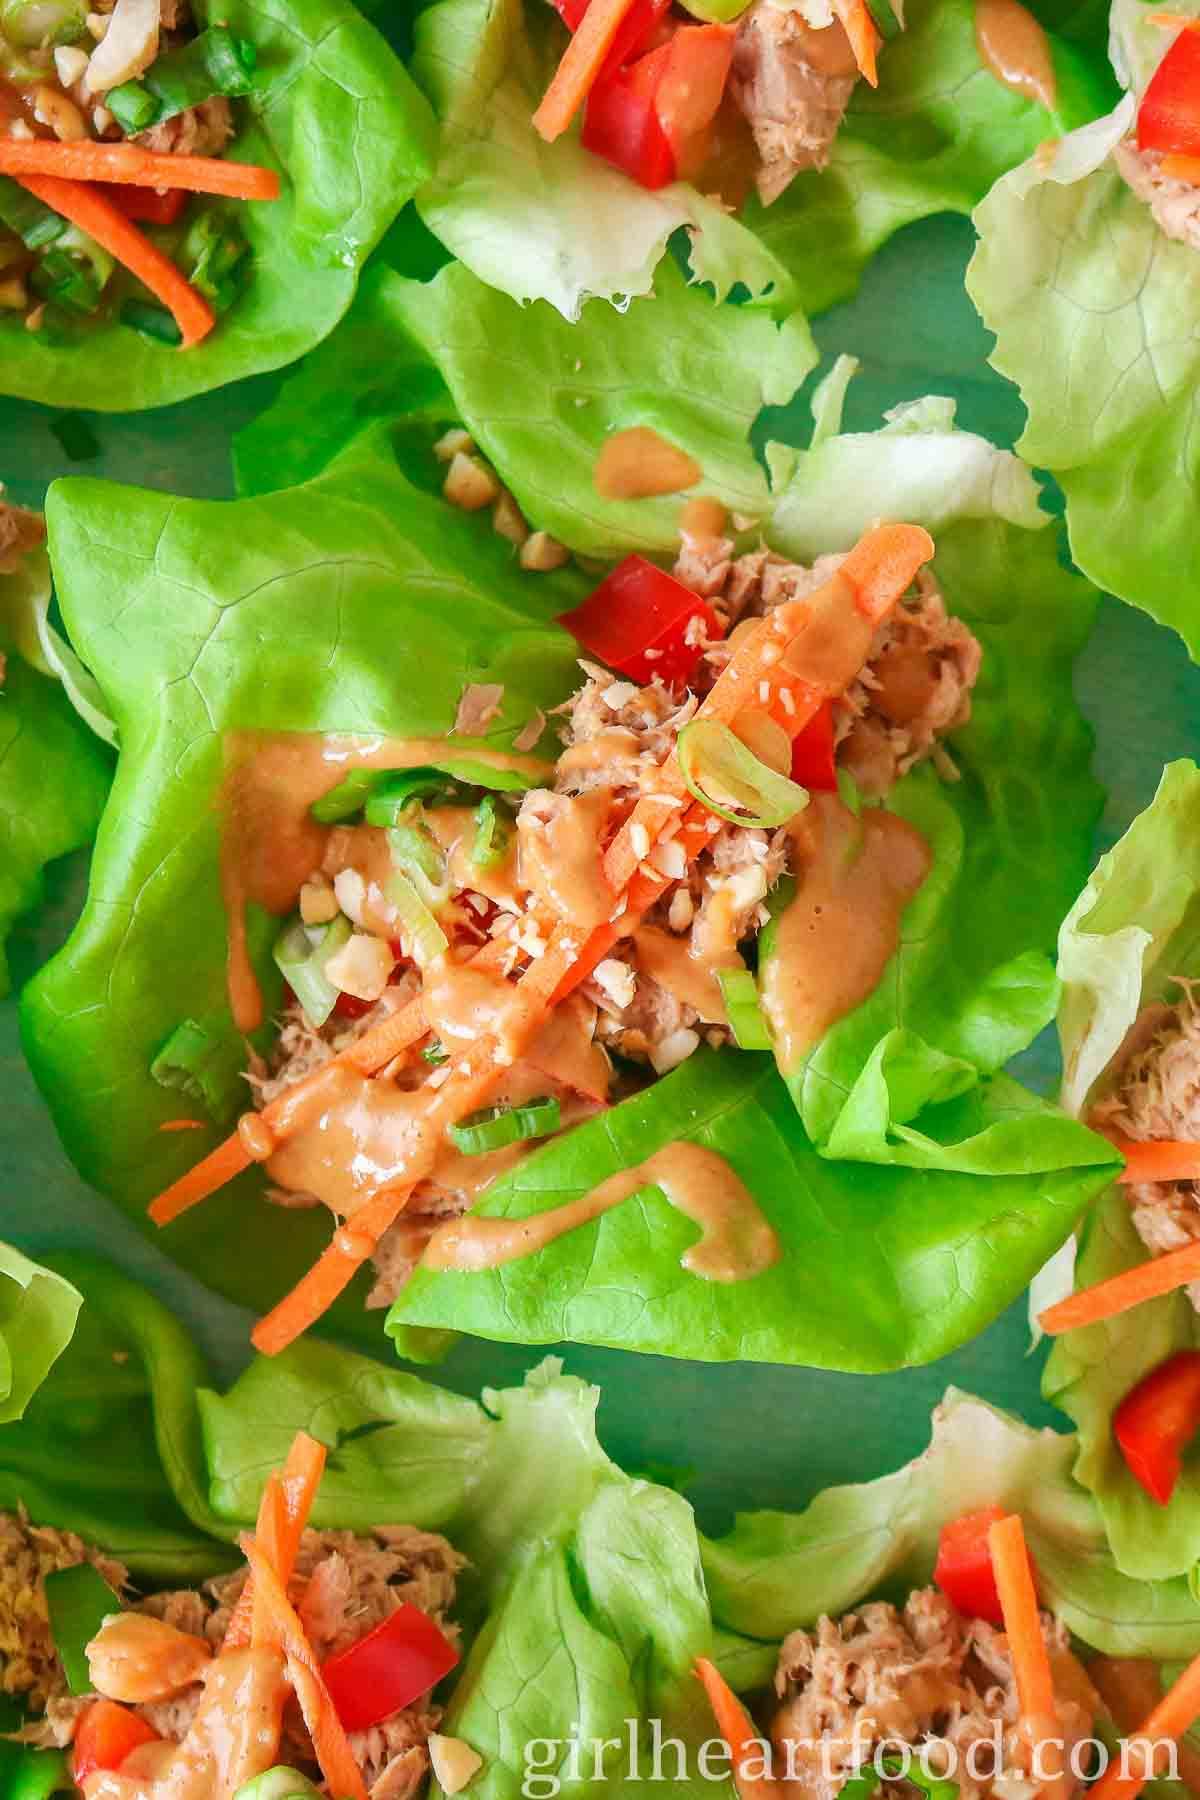 Tuna lettuce wraps with peanut sauce.